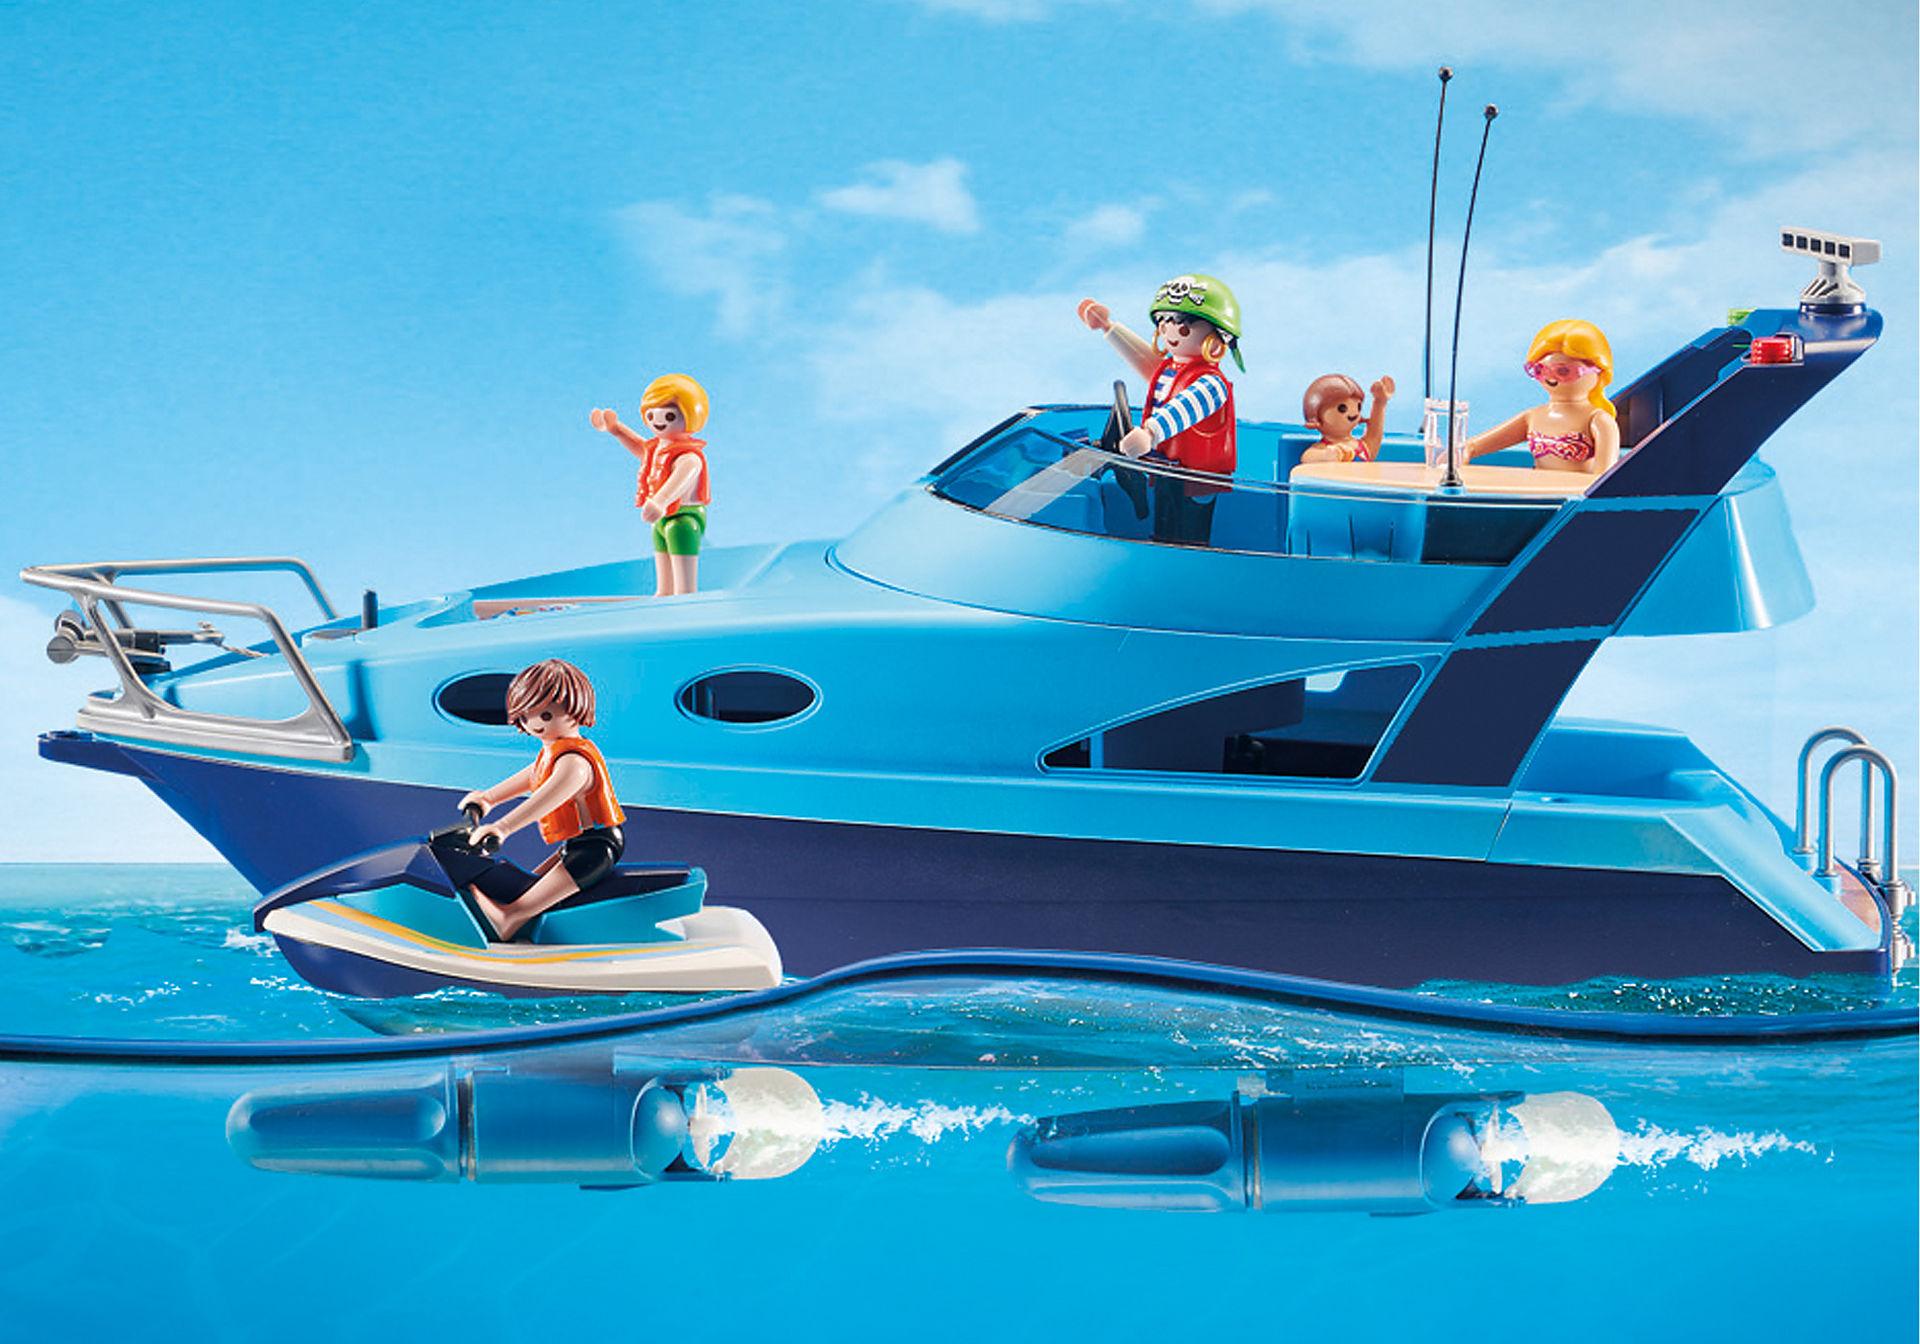 70630 PLAYMOBIL-FunPark Yacht mit Jet Ski zoom image3